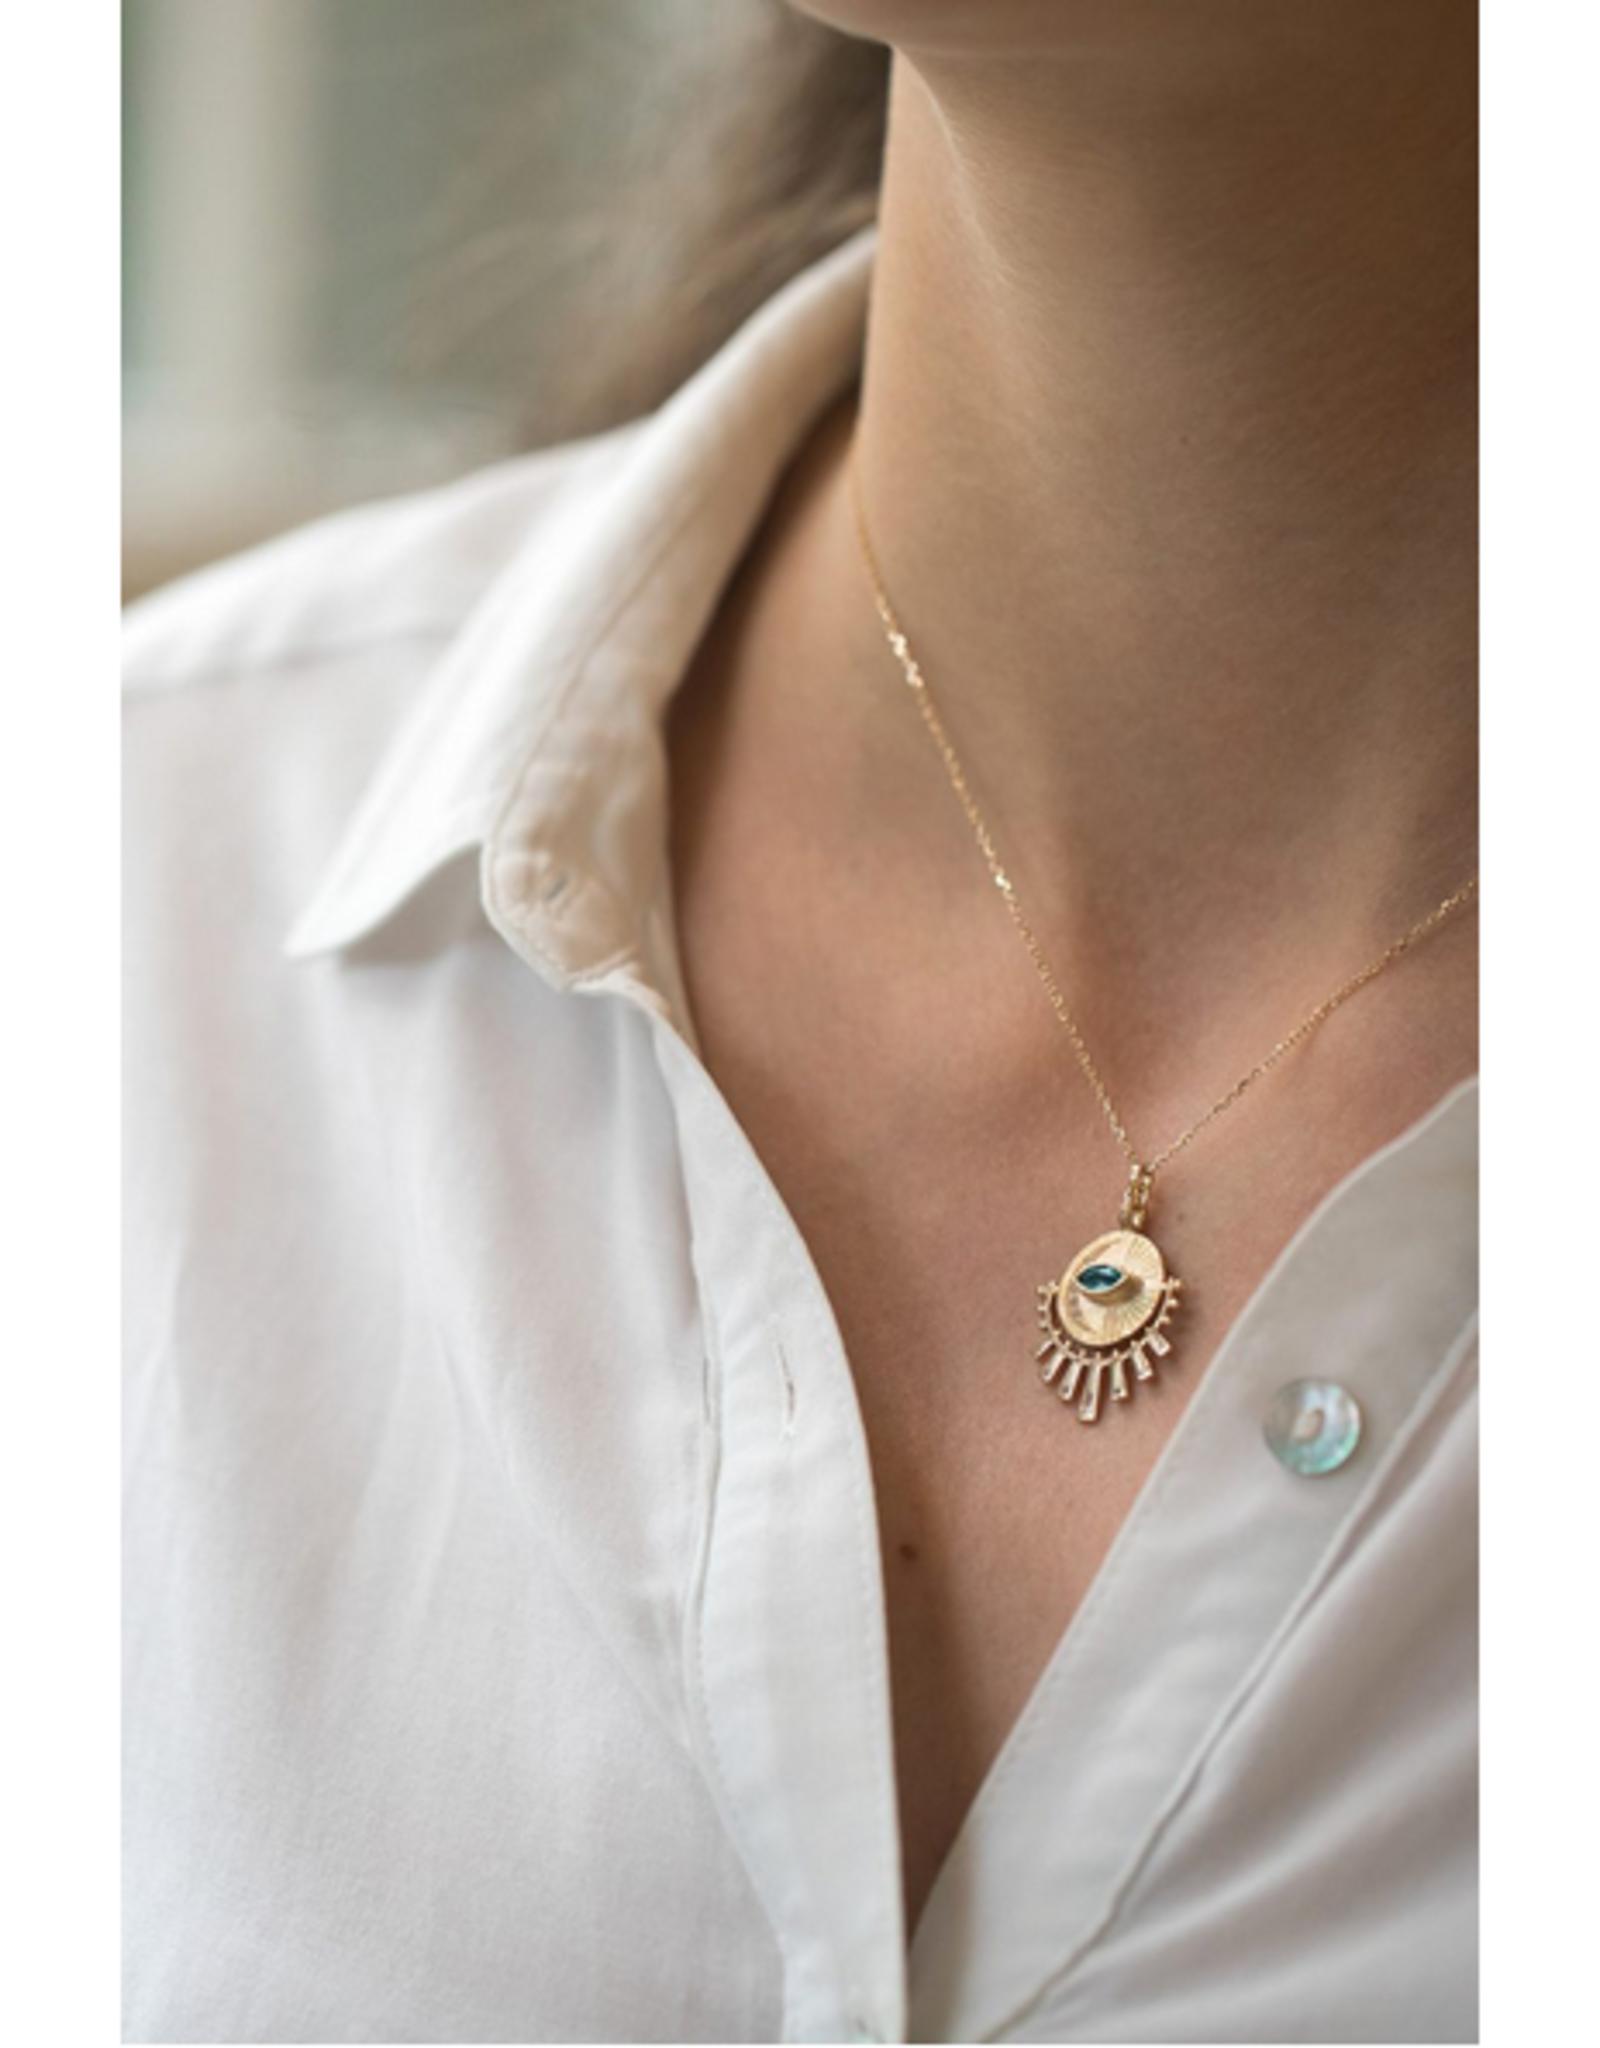 Celine Daoust Sun Beams Medallion Necklace - Marquise Green Tourmaline + Diamonds